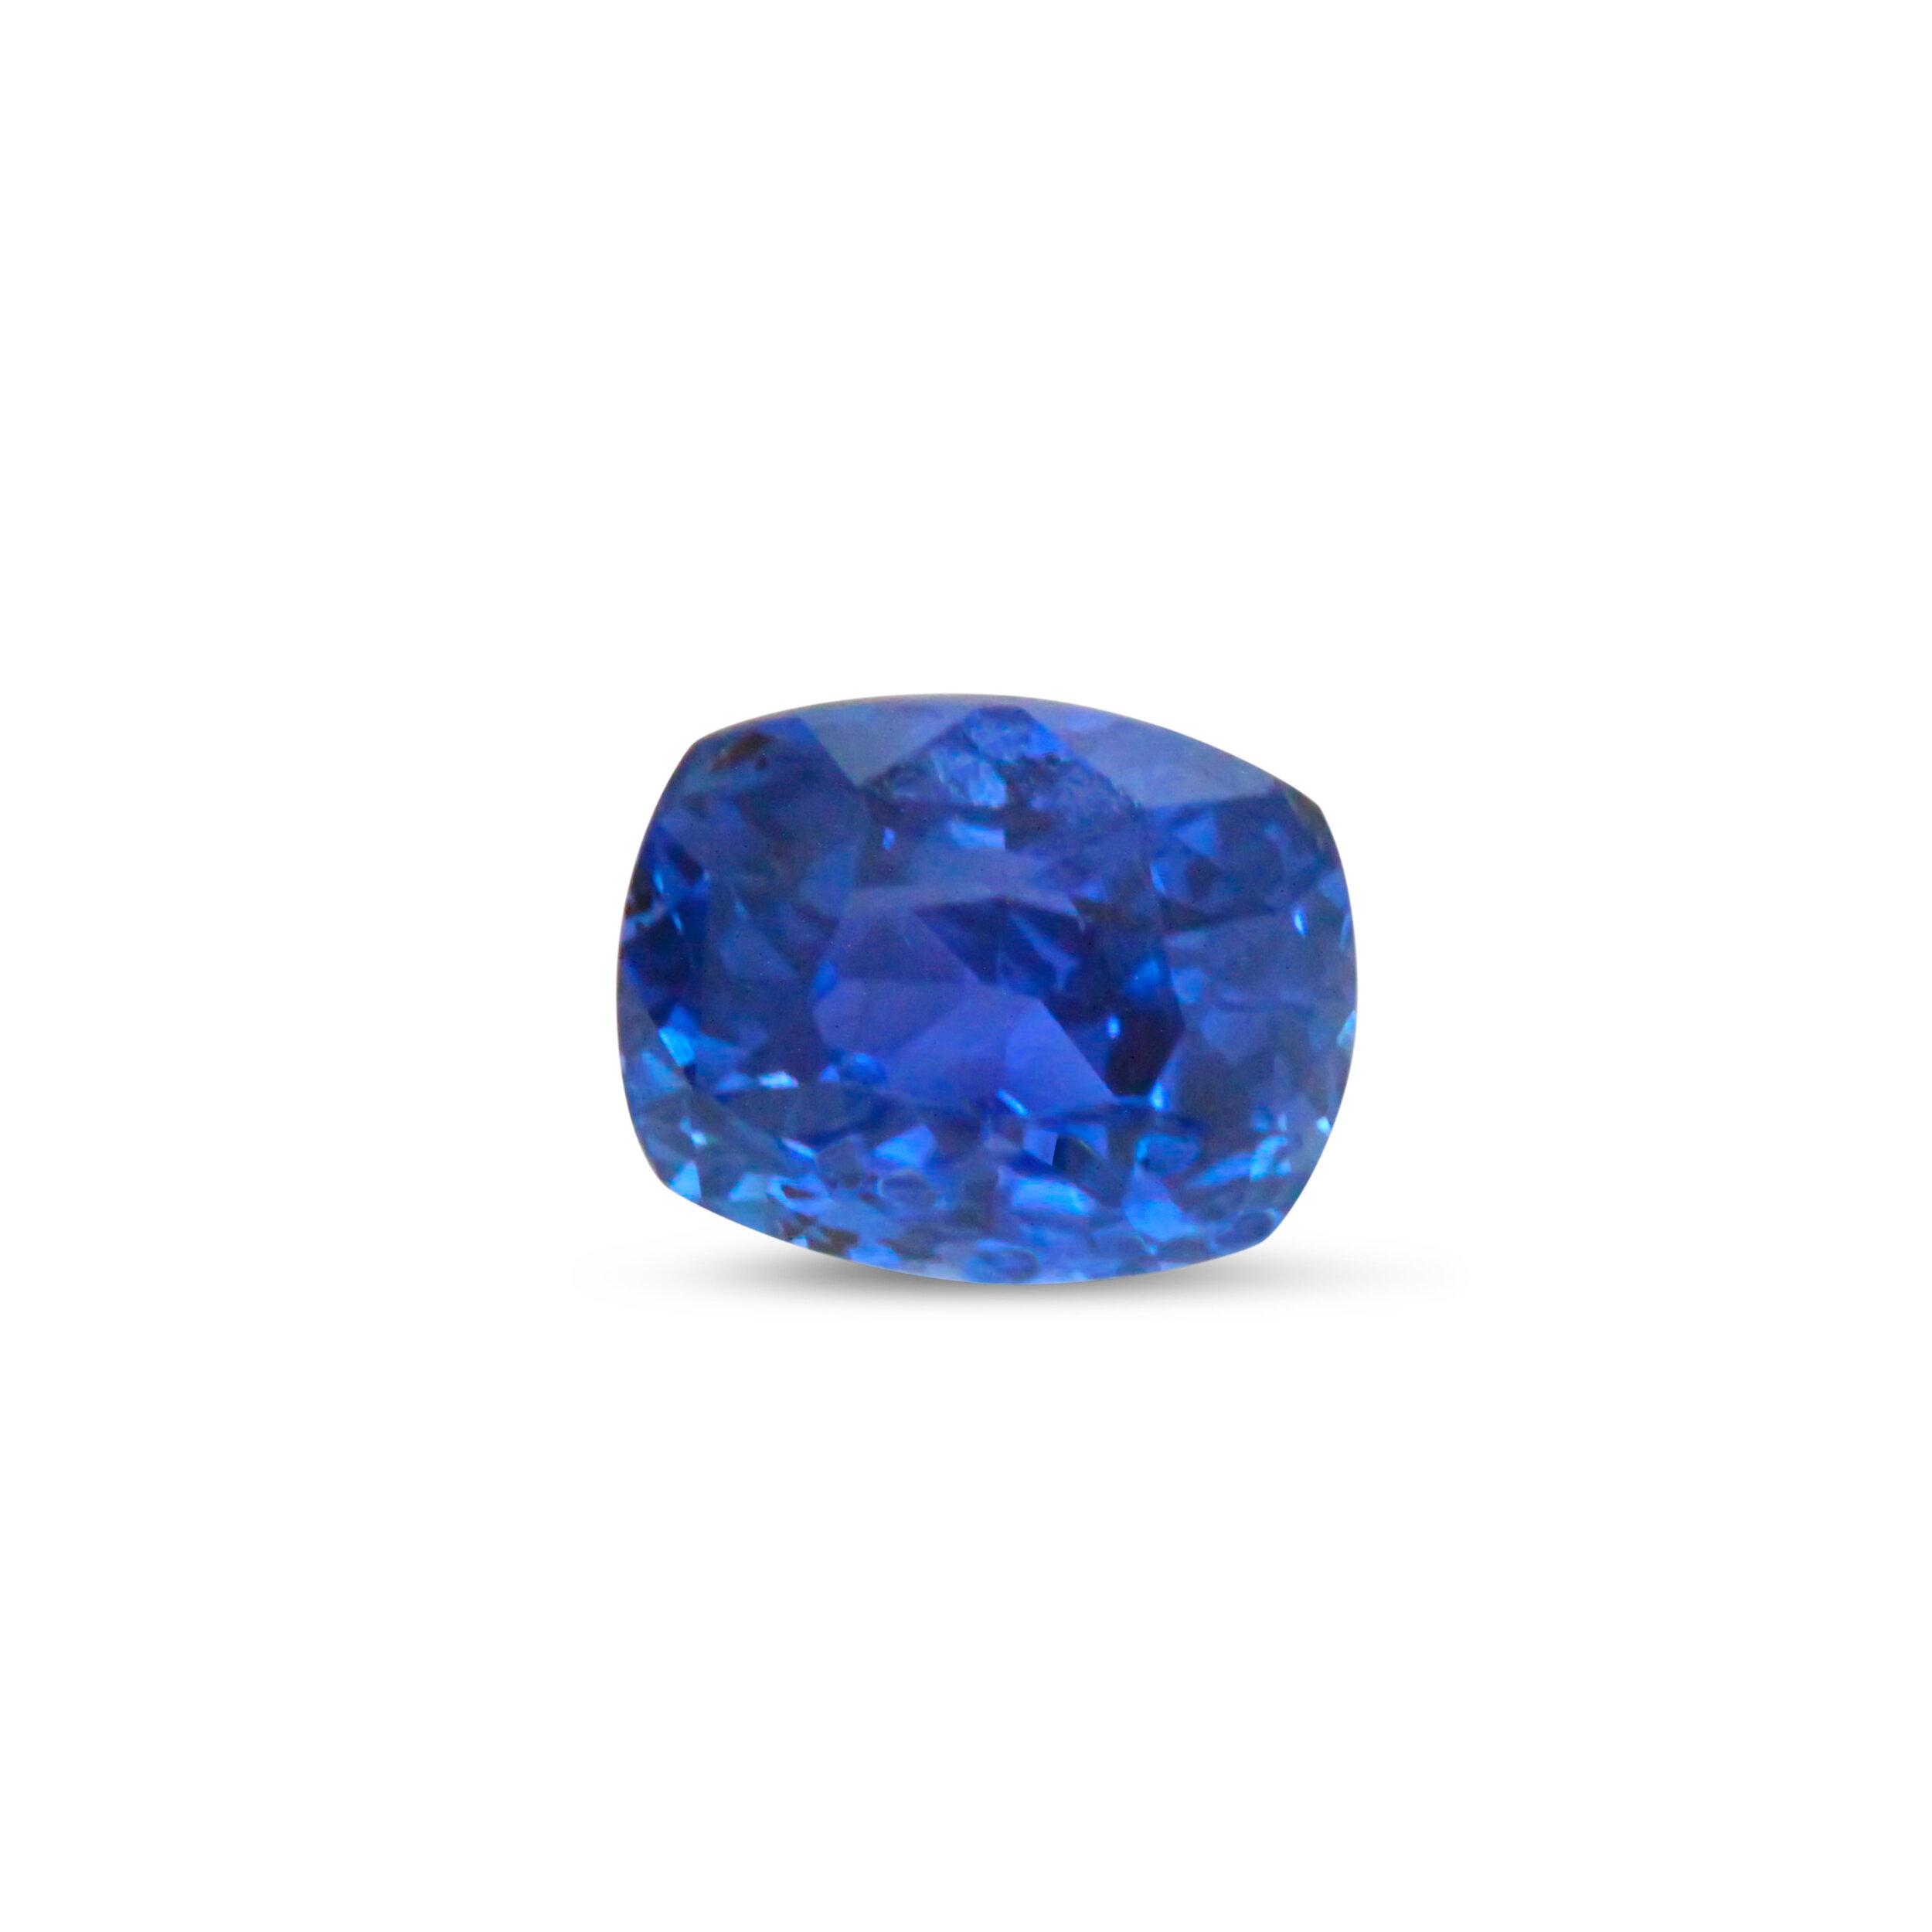 1.30 ct Unheated Ceylon Sapphire, AGL.jpg